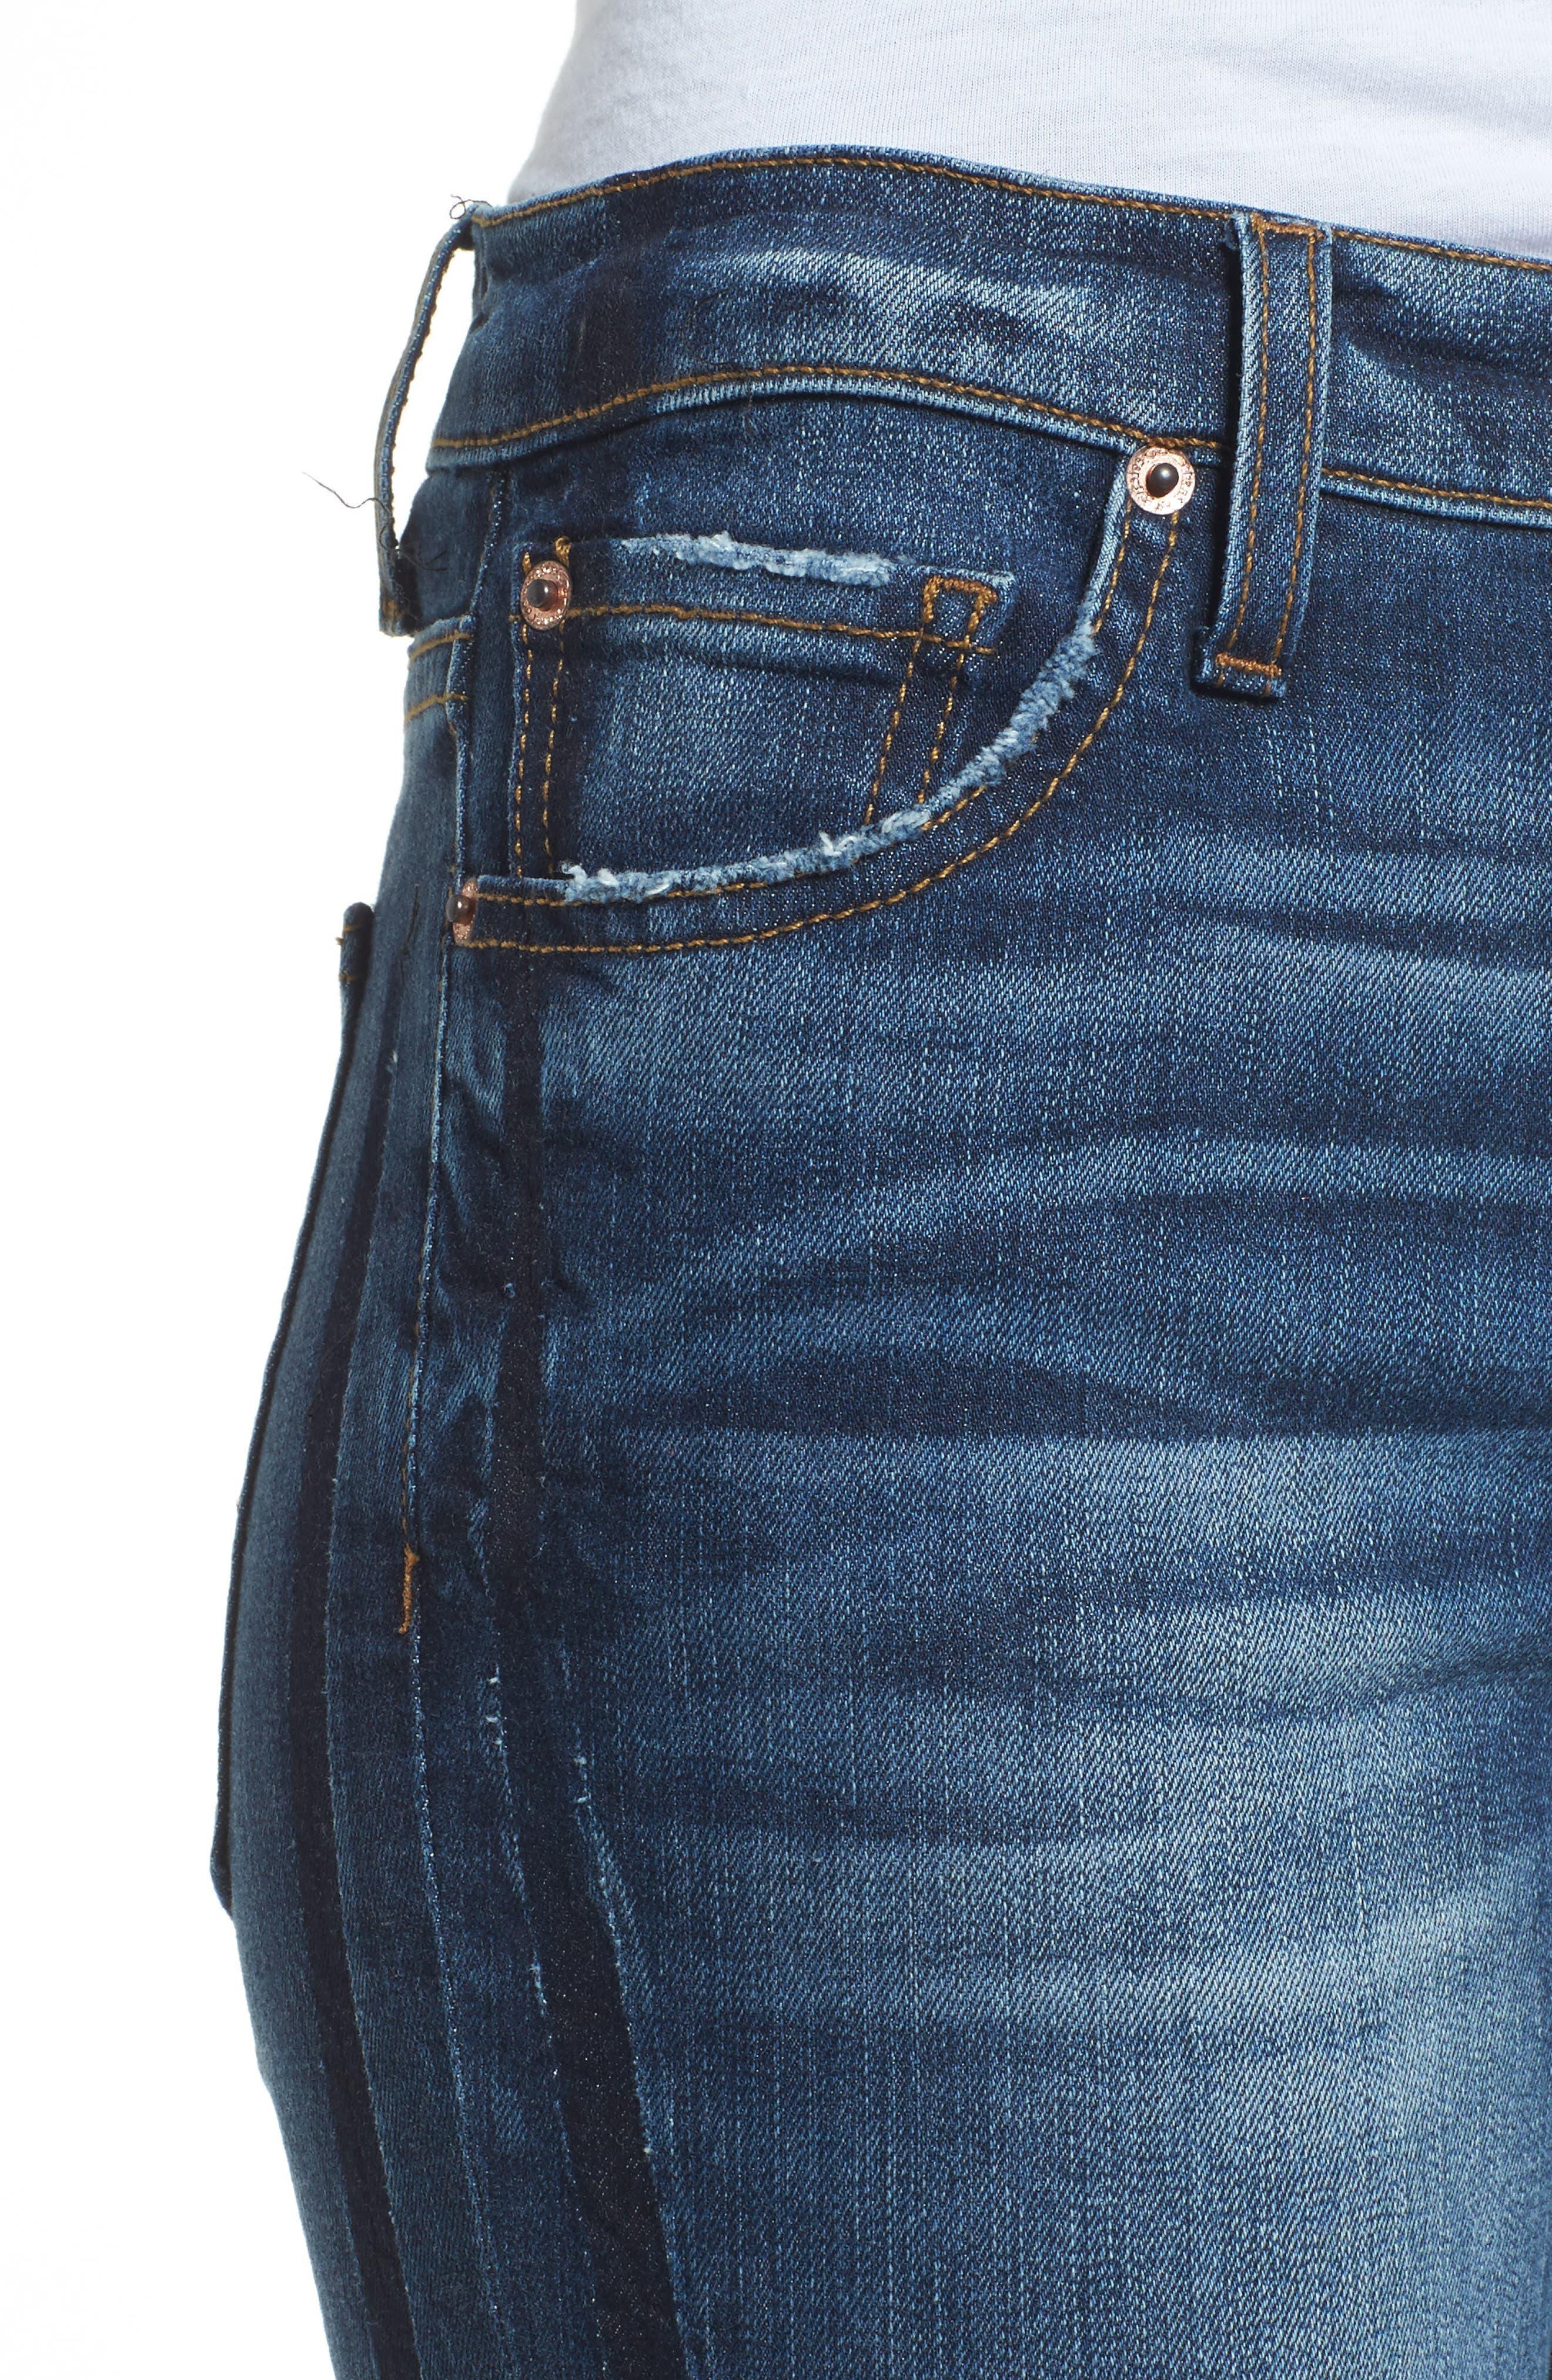 Lola Ripped Skinny Jeans,                             Alternate thumbnail 4, color,                             Carlsbad Fest East